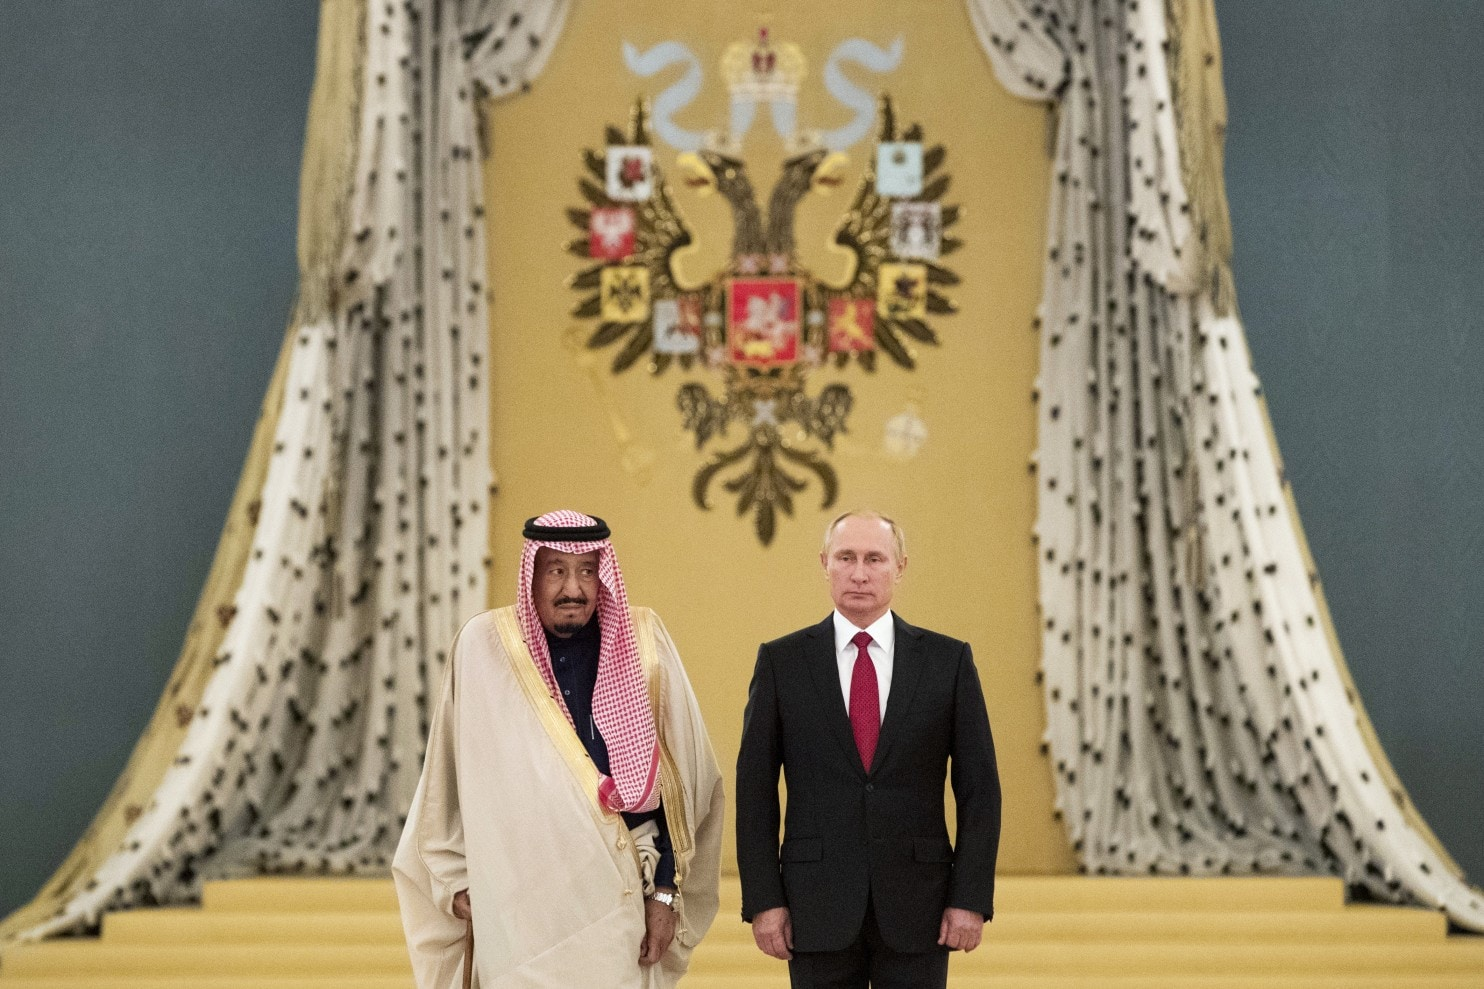 Russia_Saudi_Arabia_48456.jpg-0ca73.jpg